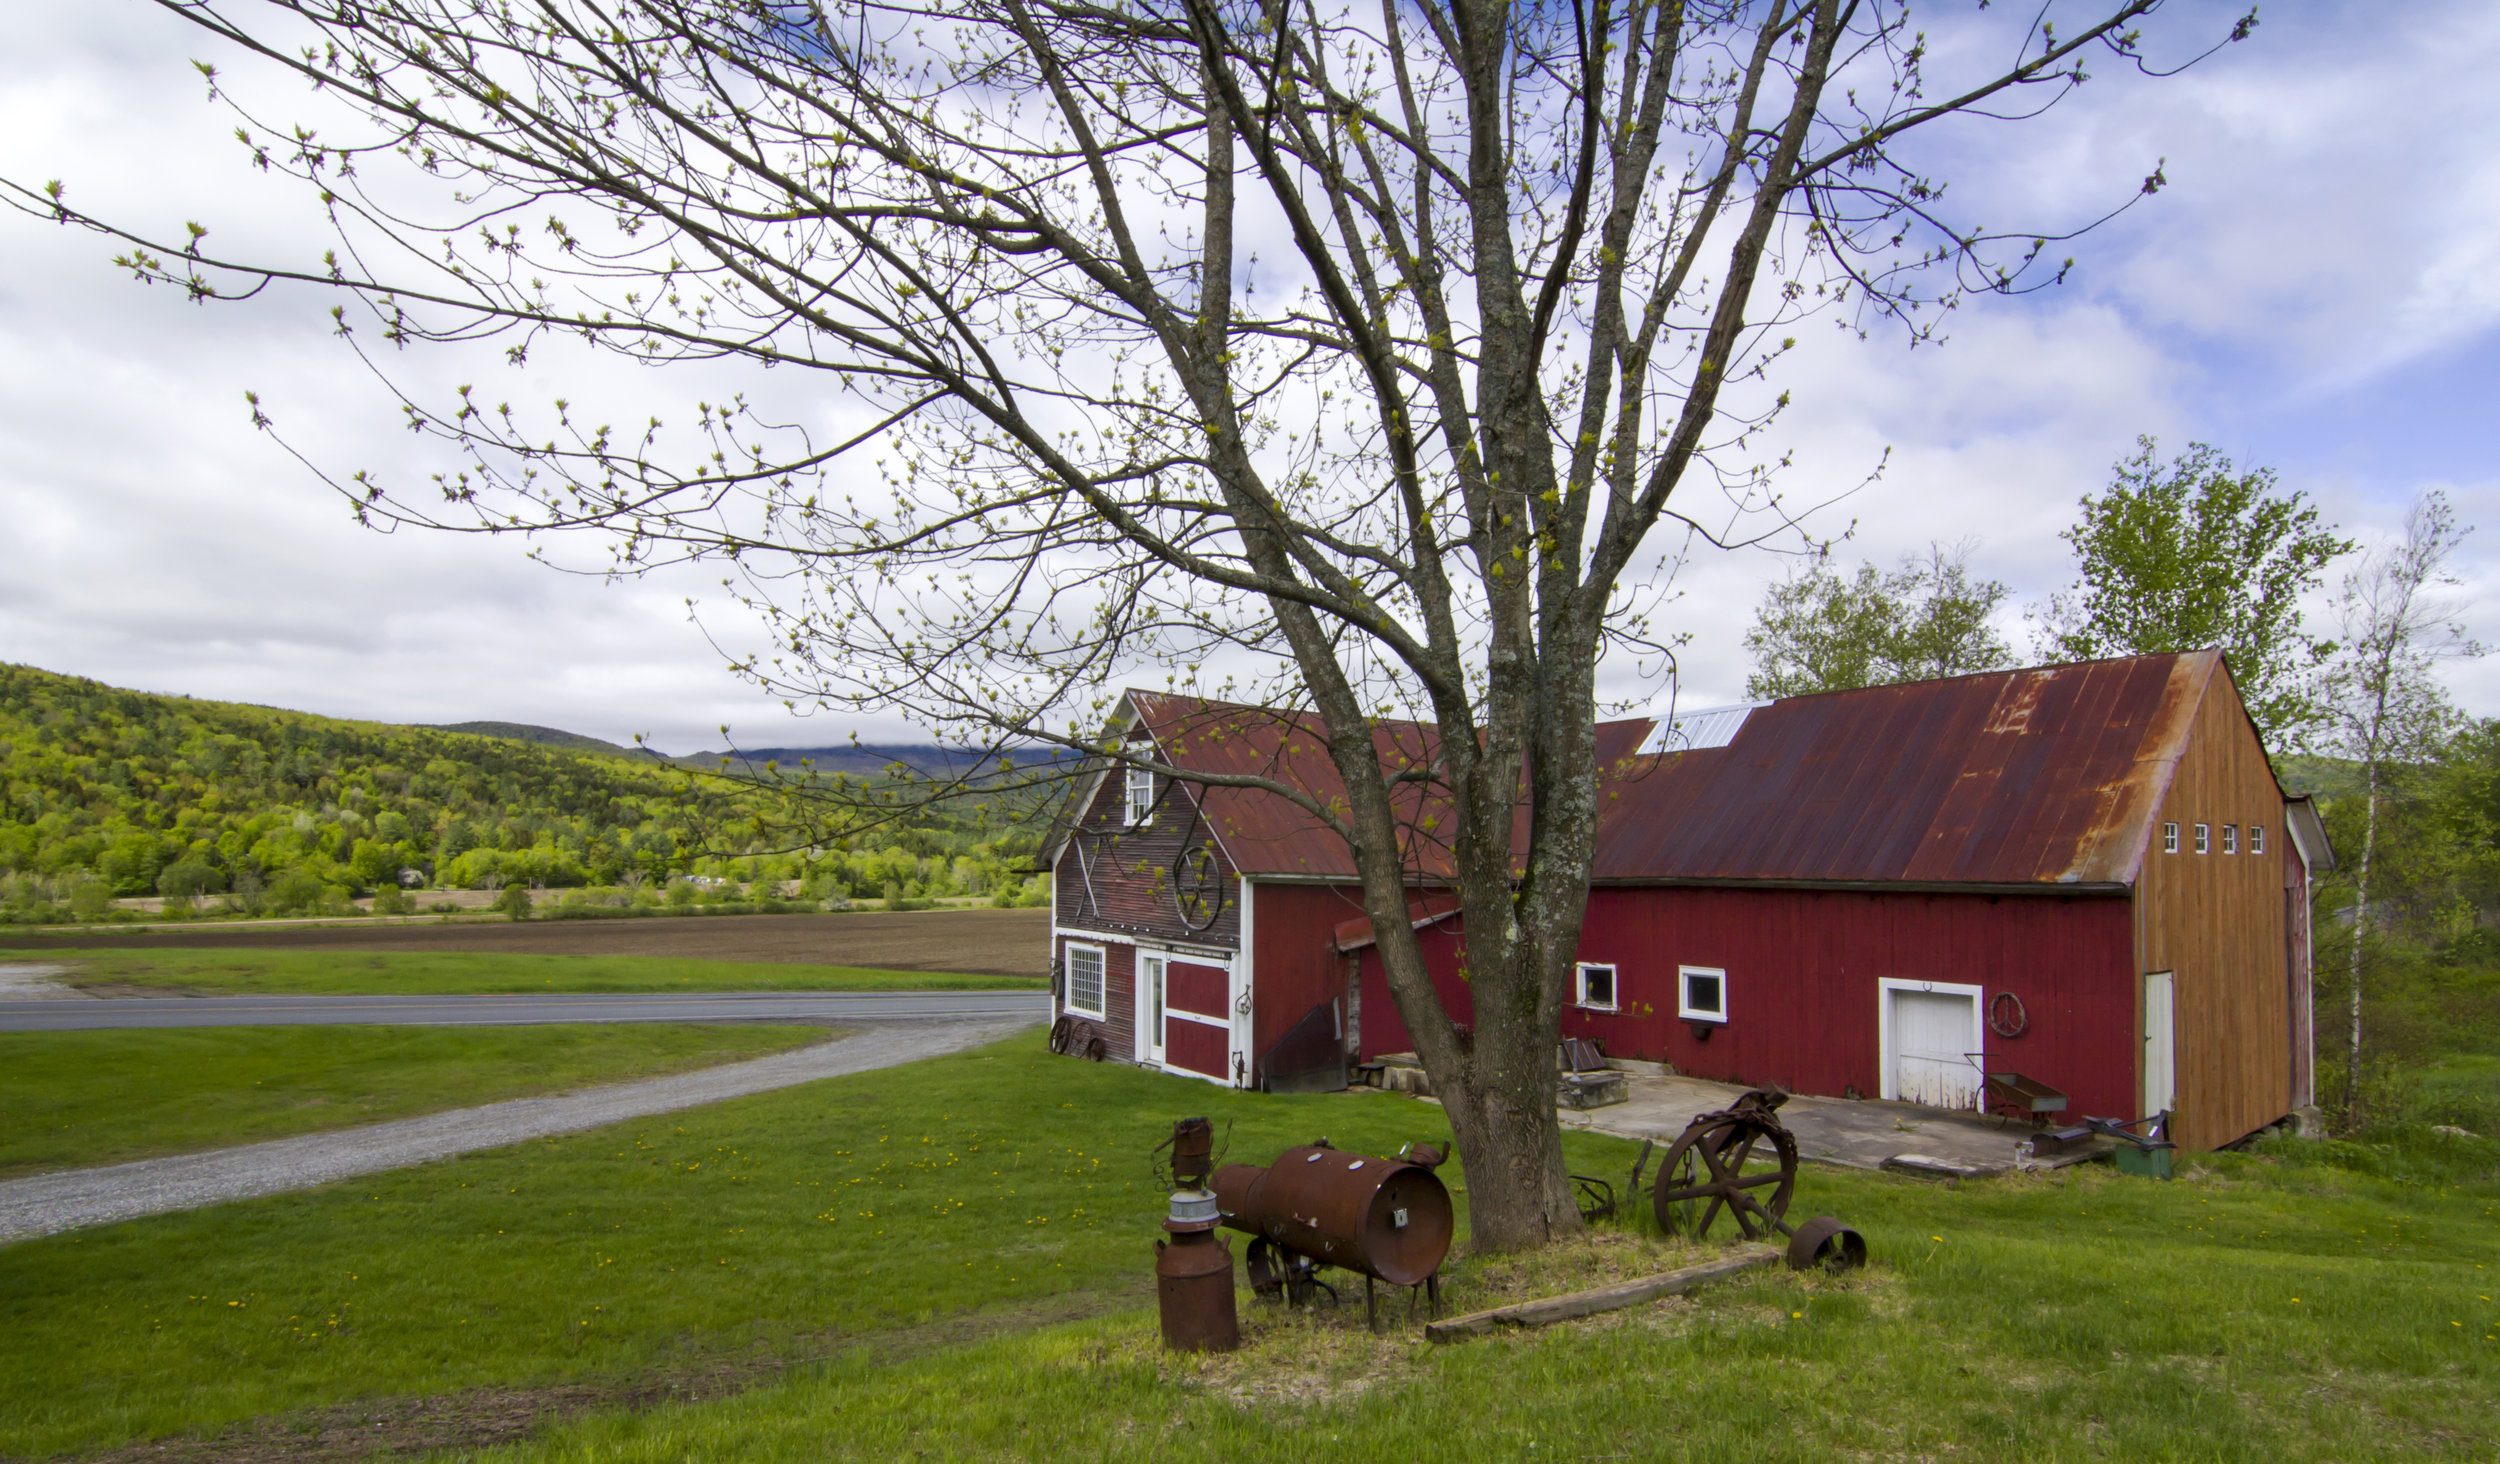 11-2019-05-29 IMG_5021 McGlinchey Barn.jpg